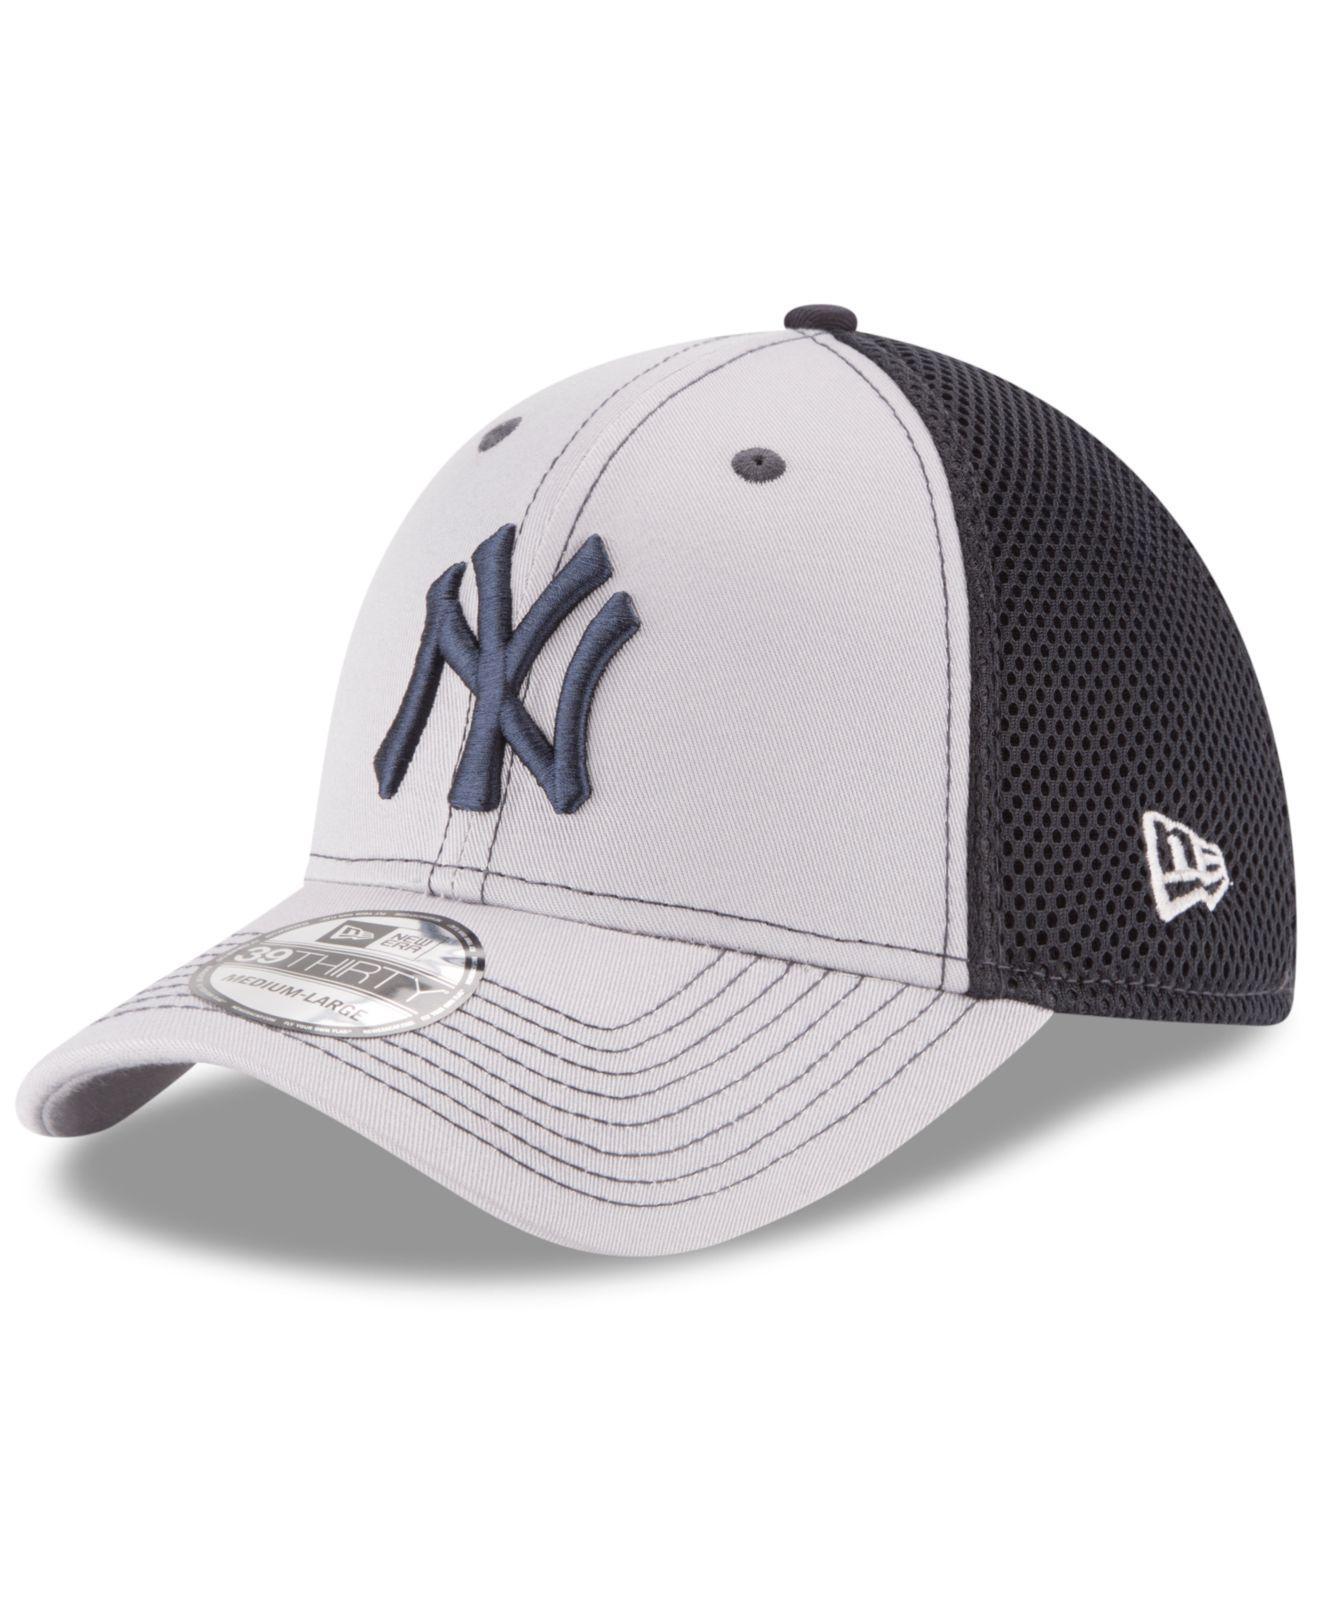 9b1a7141c10148 Lyst - Ktz New York Yankees Team Front Neo 39thirty Cap in Black for Men